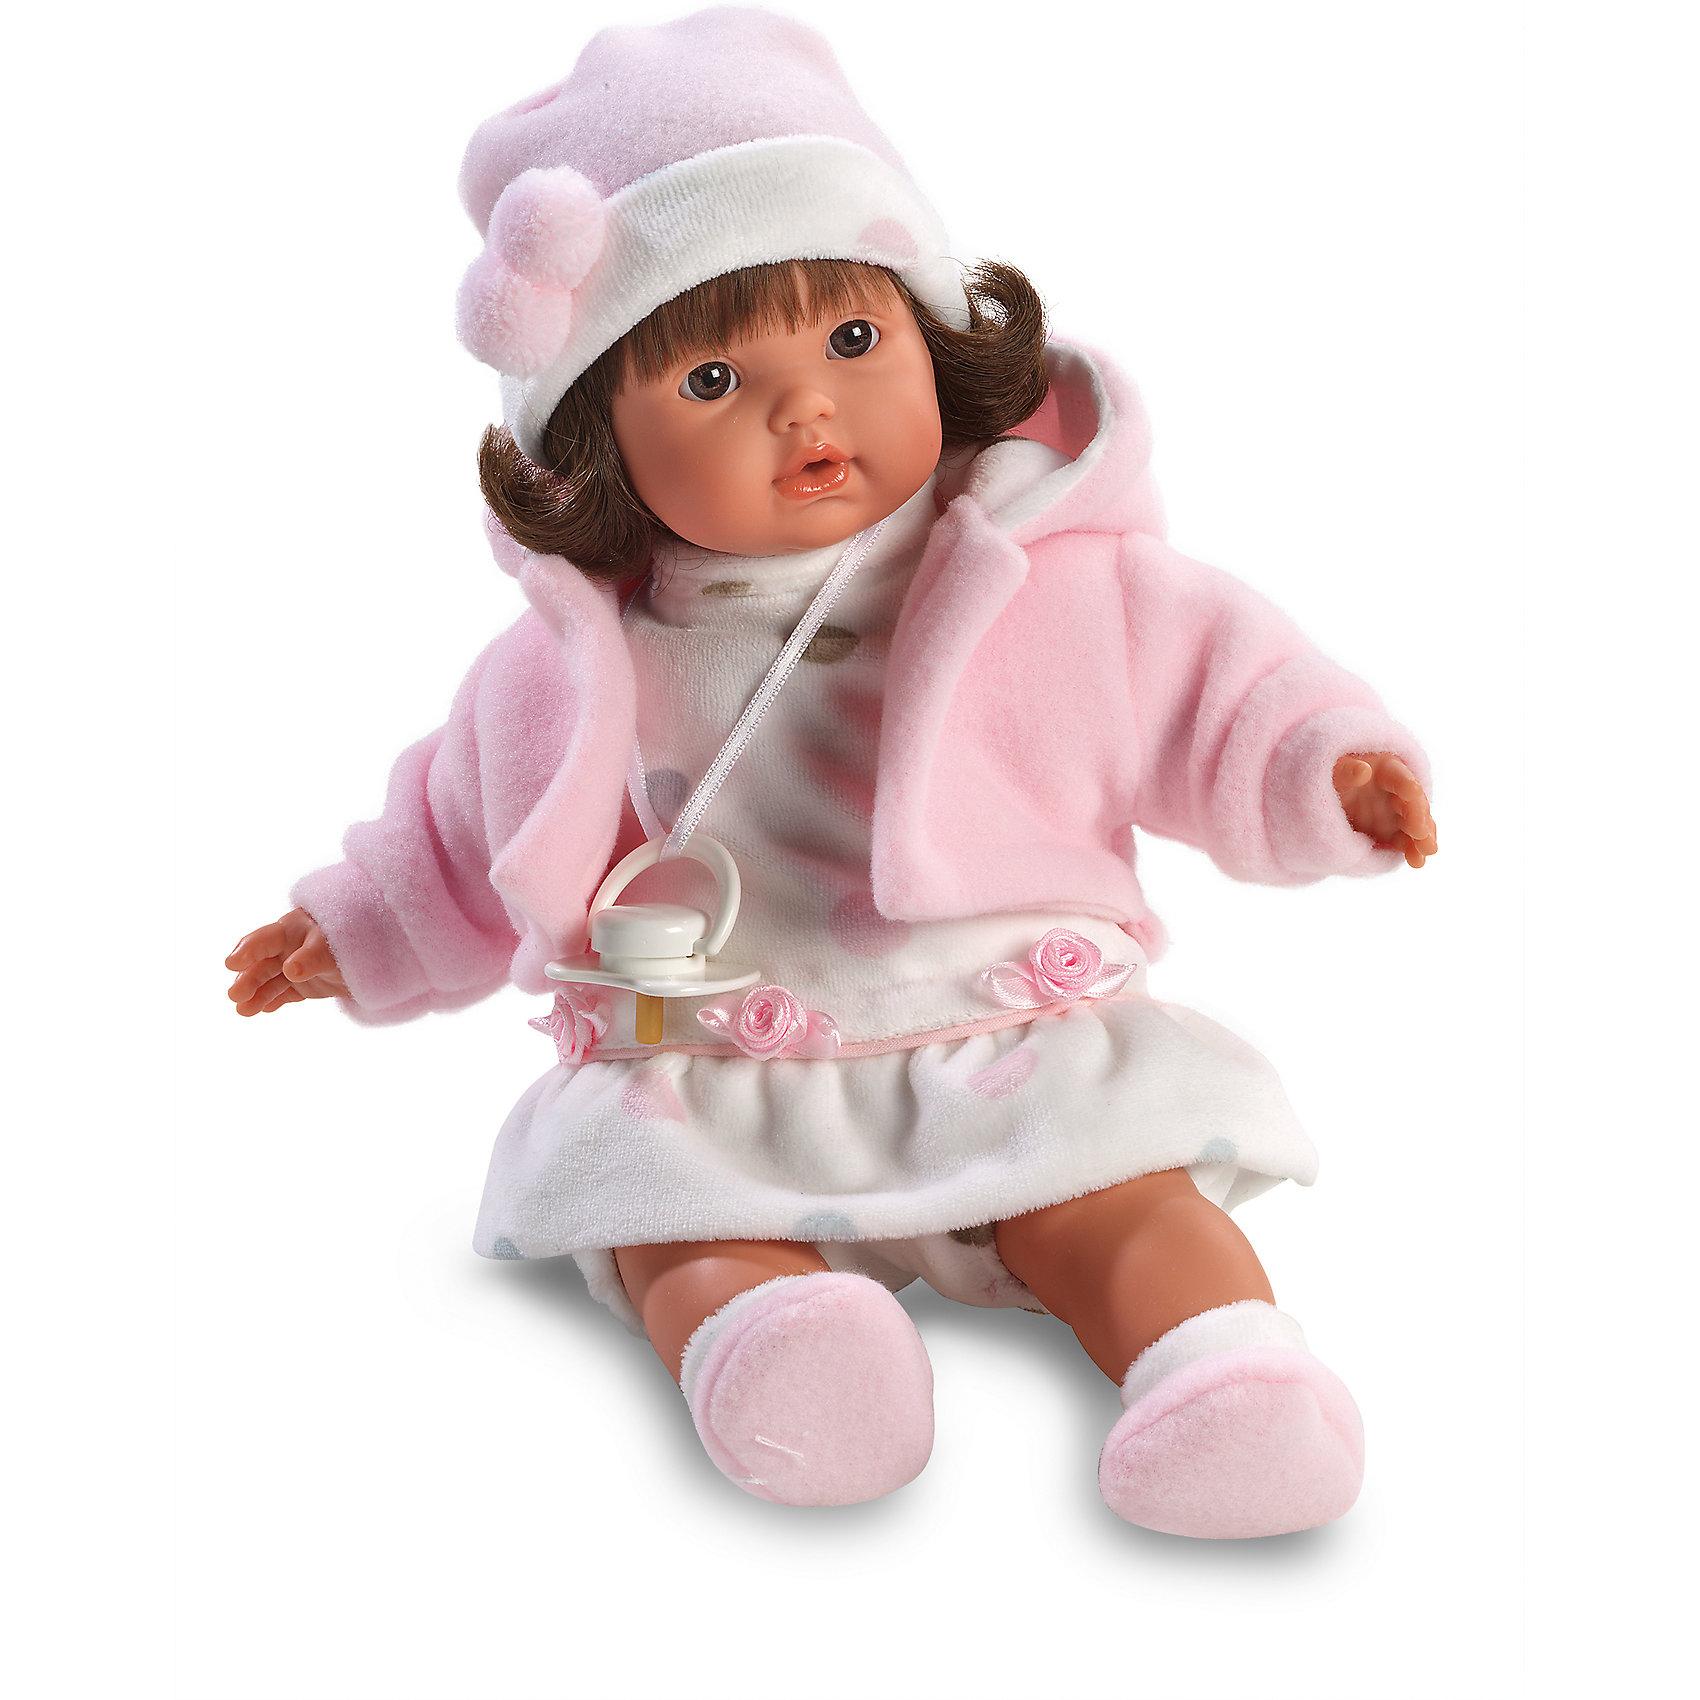 Llorens Кукла София, 33 см, Llorens куклы и одежда для кукол llorens кукла алиса 33 см со звуком